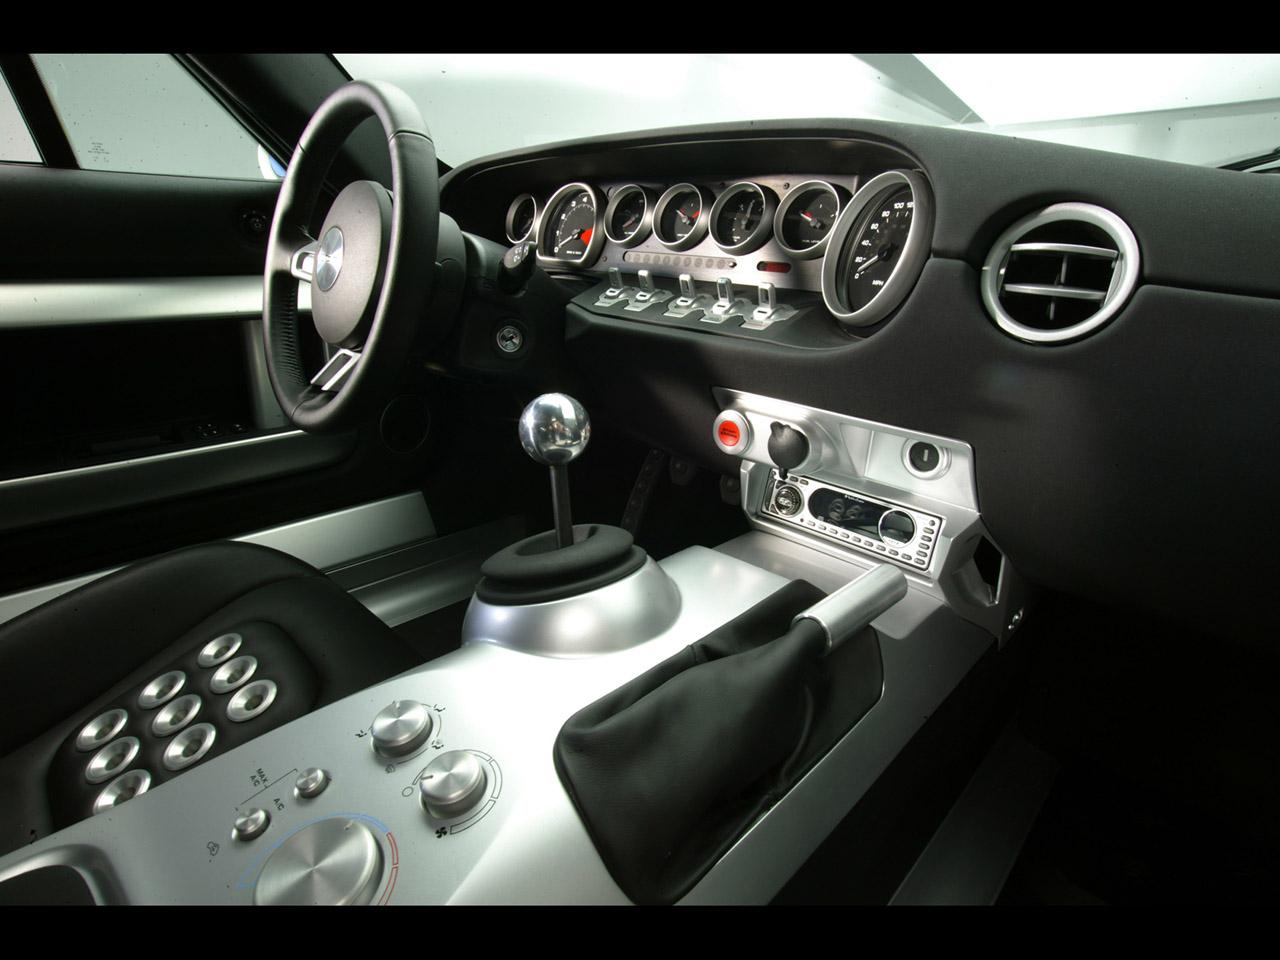 2005-Ford-GT-Interior-1280x960.jpg